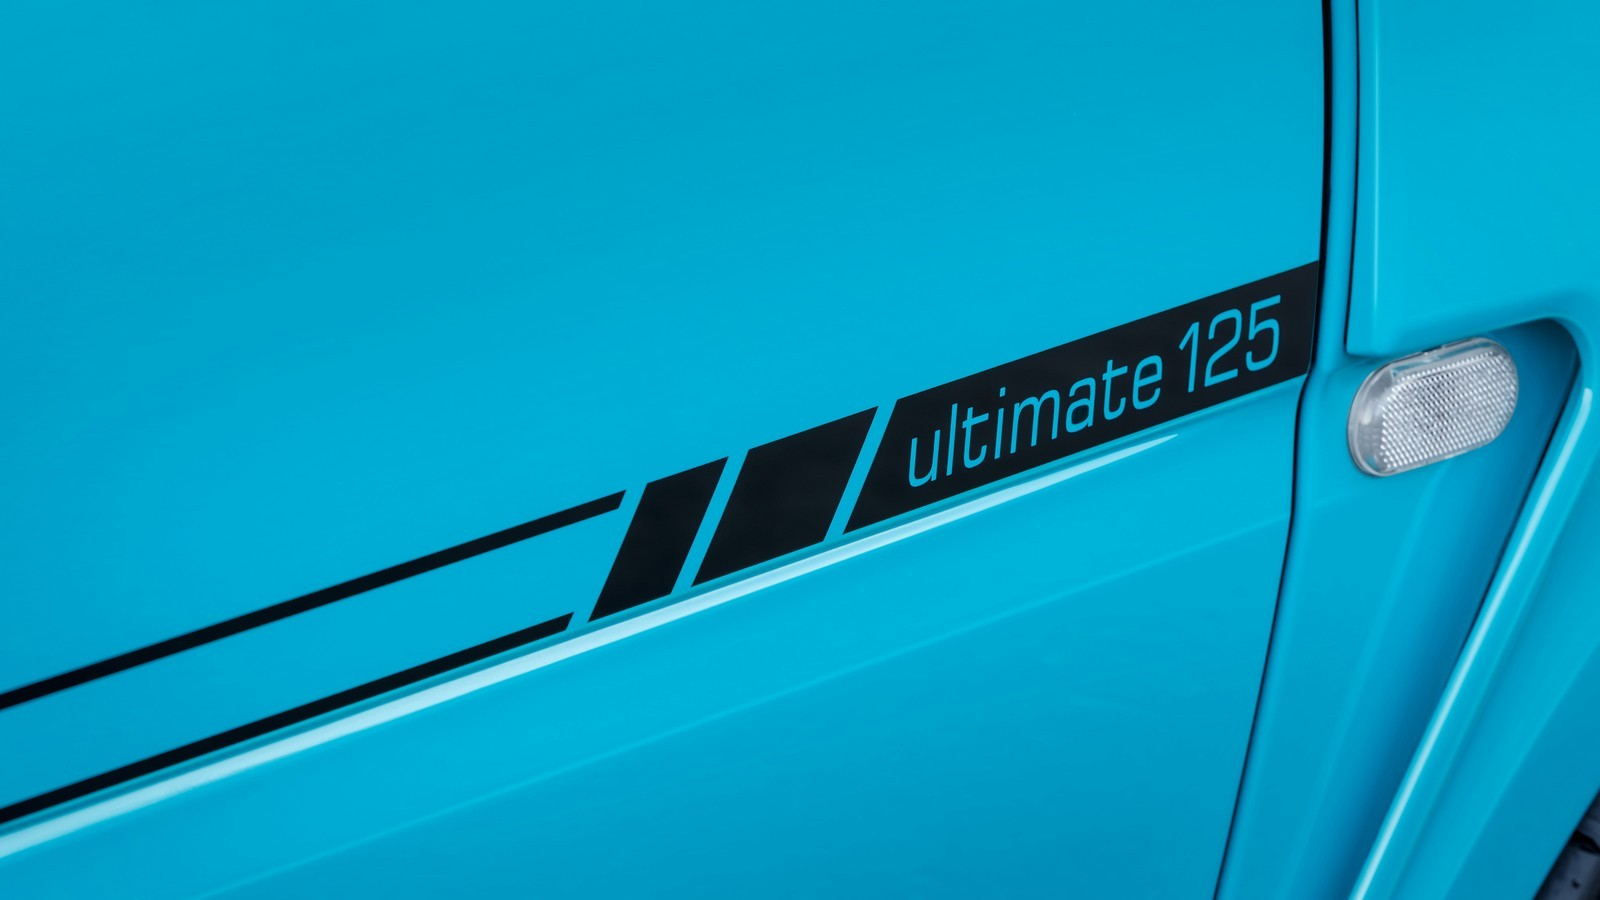 brabus_ultimate_125_1